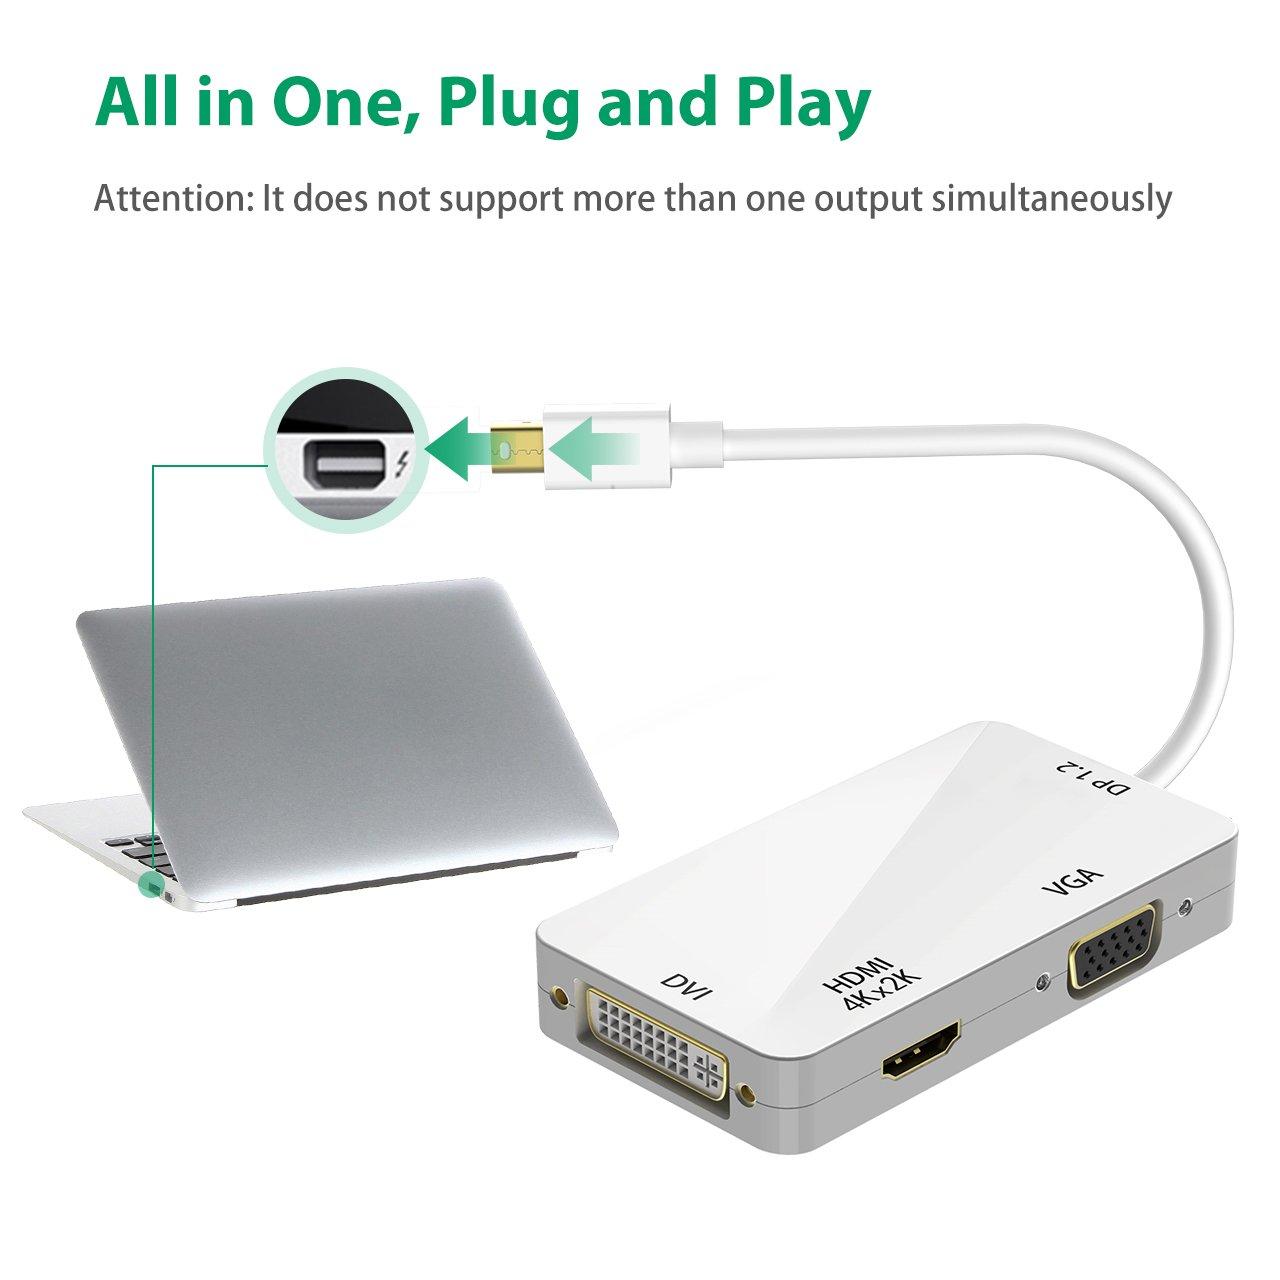 Victsing 3 In 1 Mini Displayport Thunderbolt To Hdmi Dvi Vga Converter Display Port Dp Adapter 4k